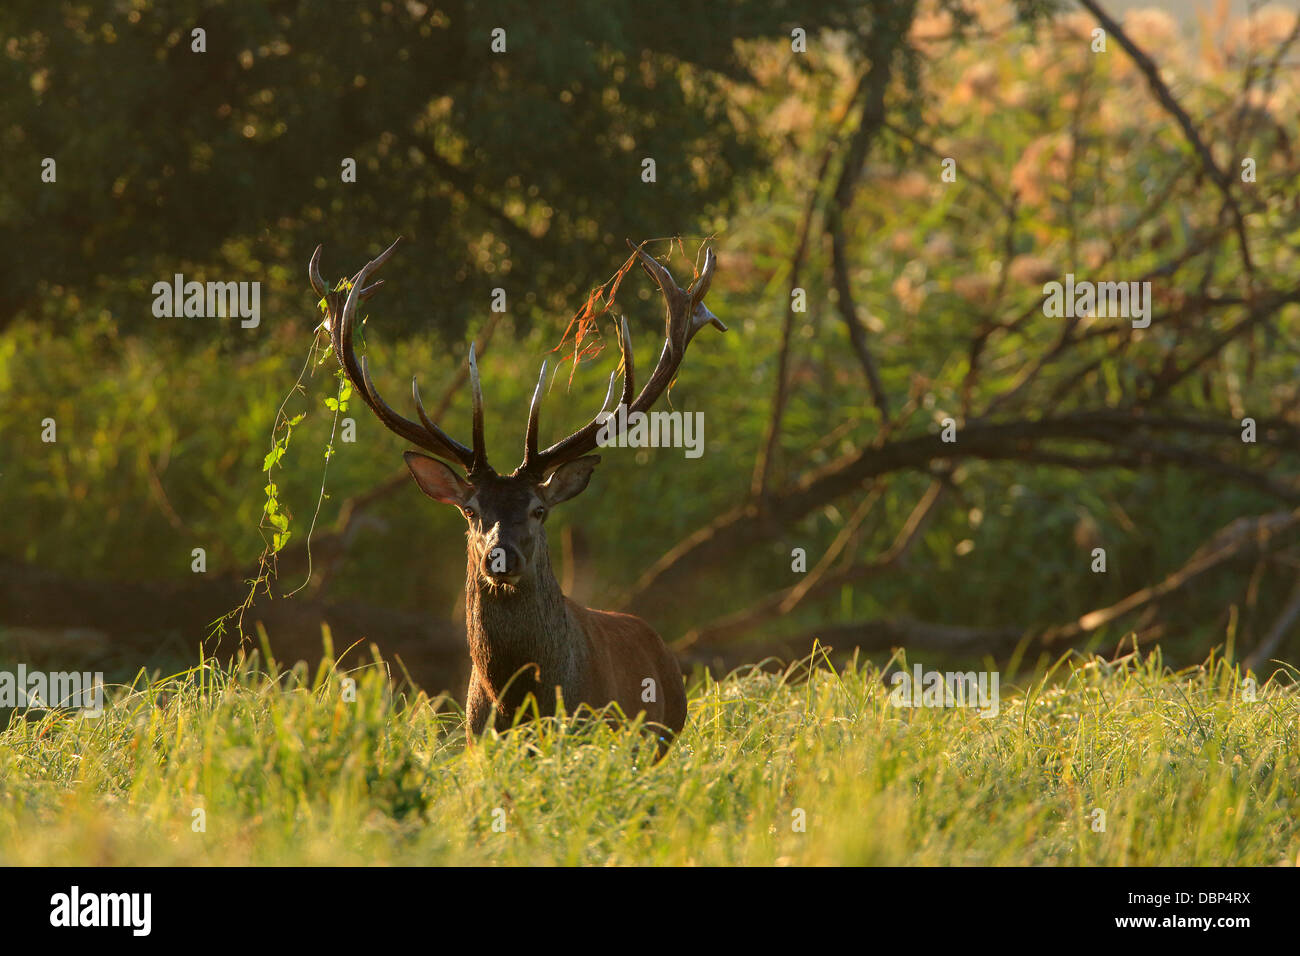 Stag In Grassy Landscape - Stock Image